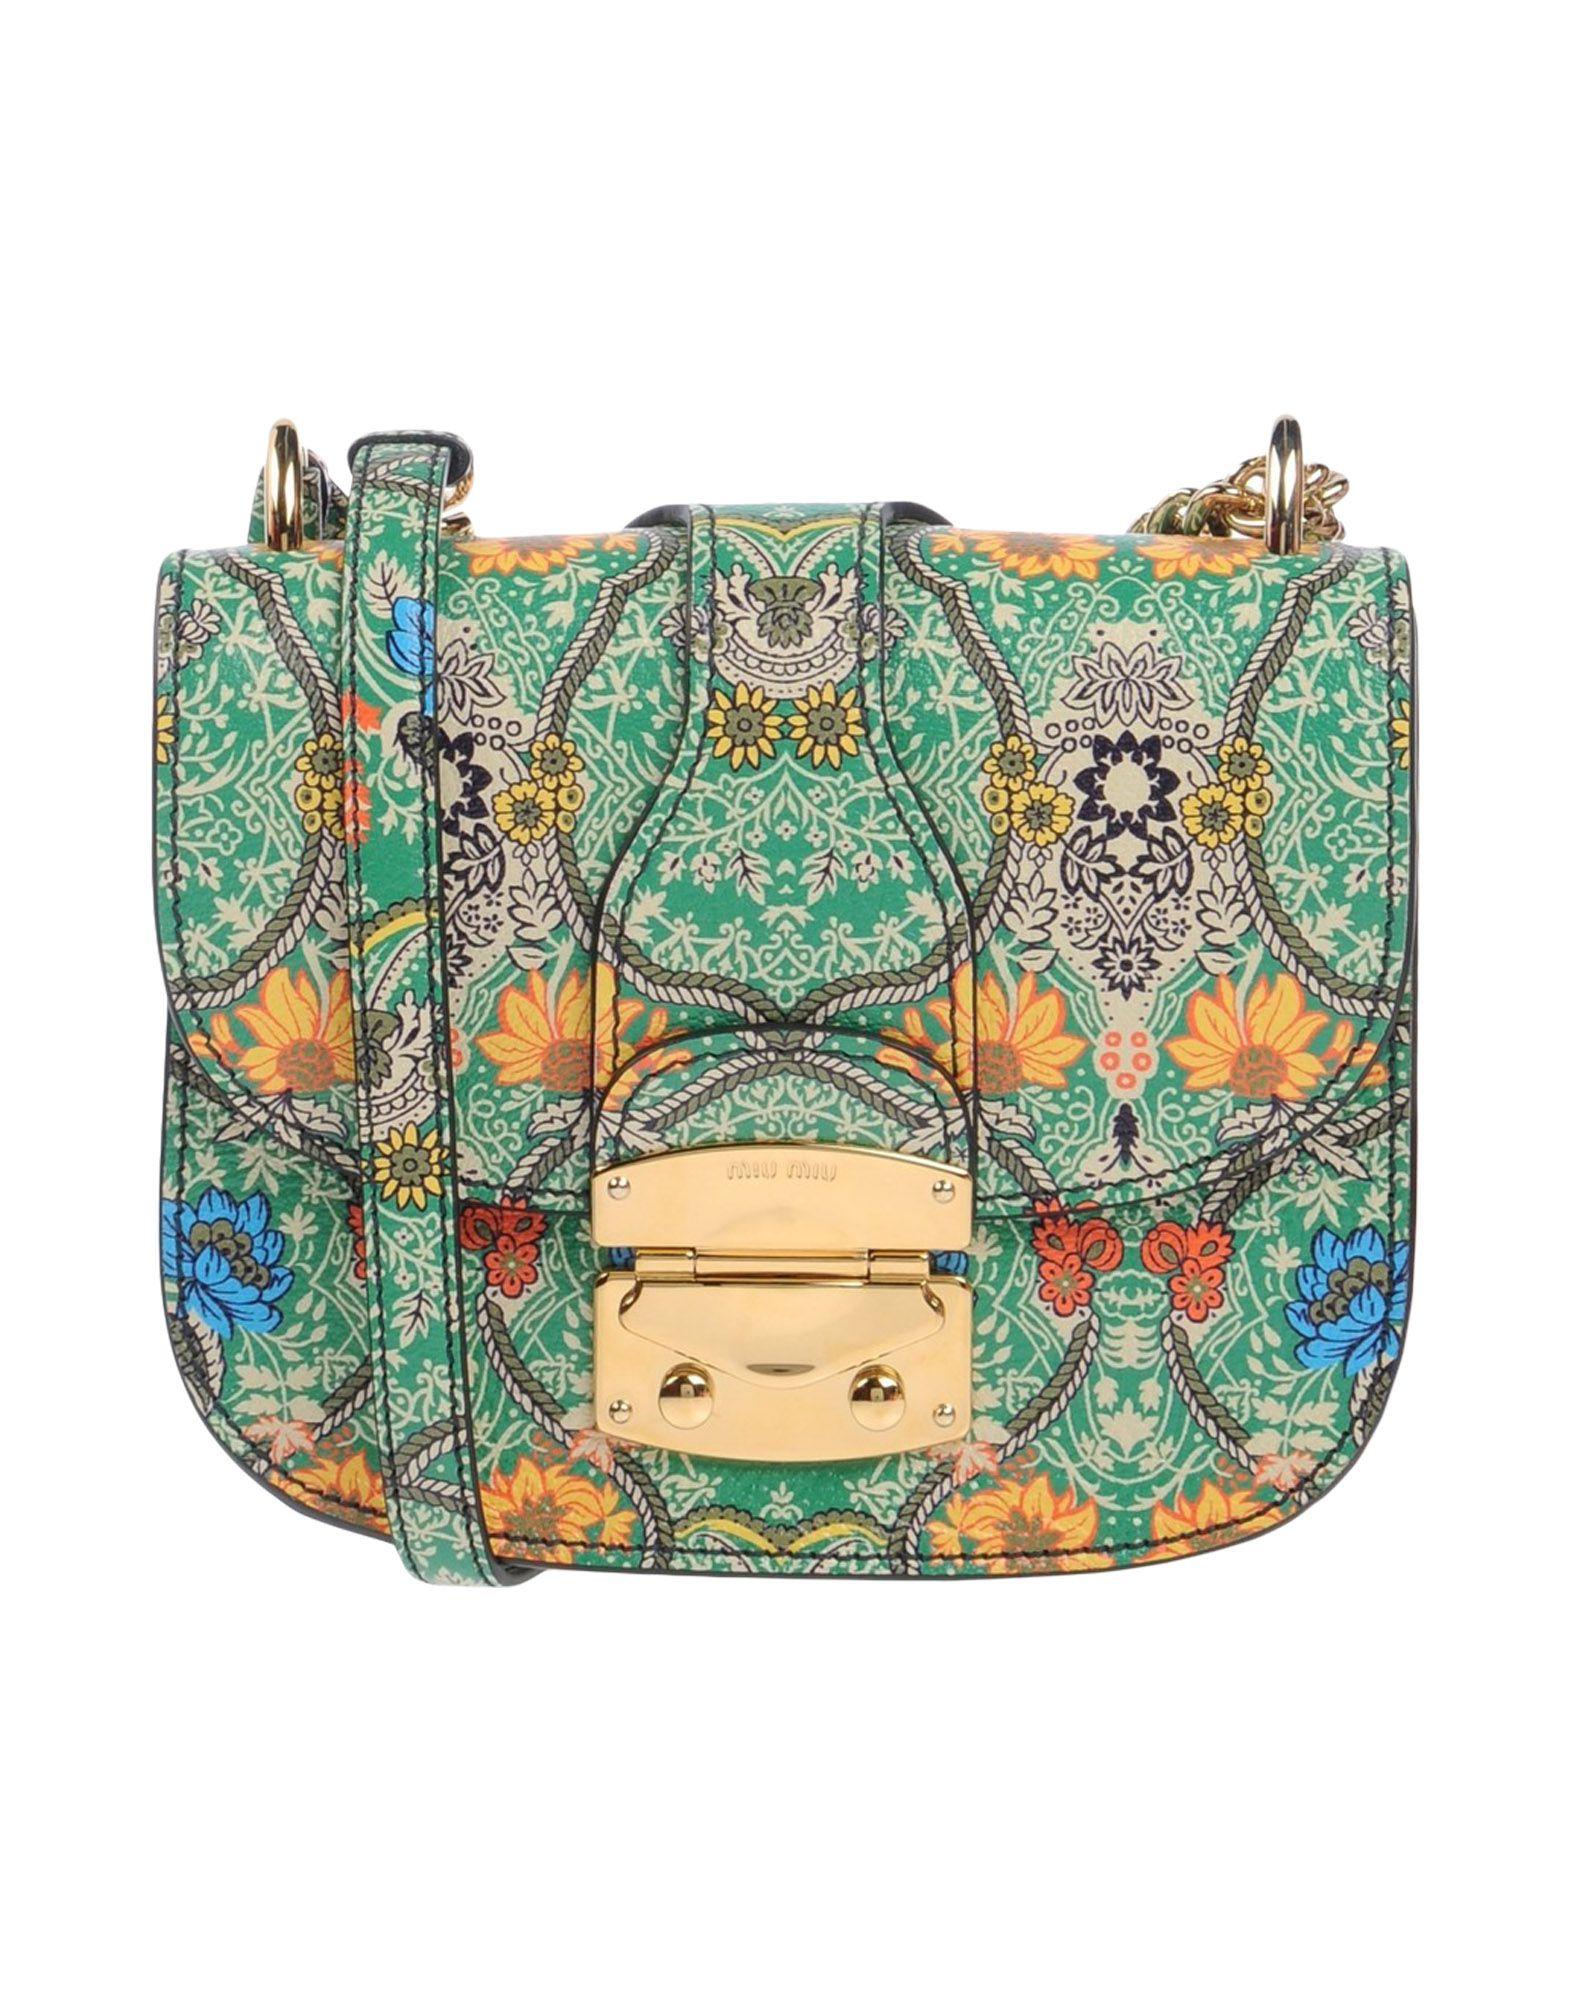 MIU MIU Сумка через плечо сумка miu miu p00126898 miumiu 2015